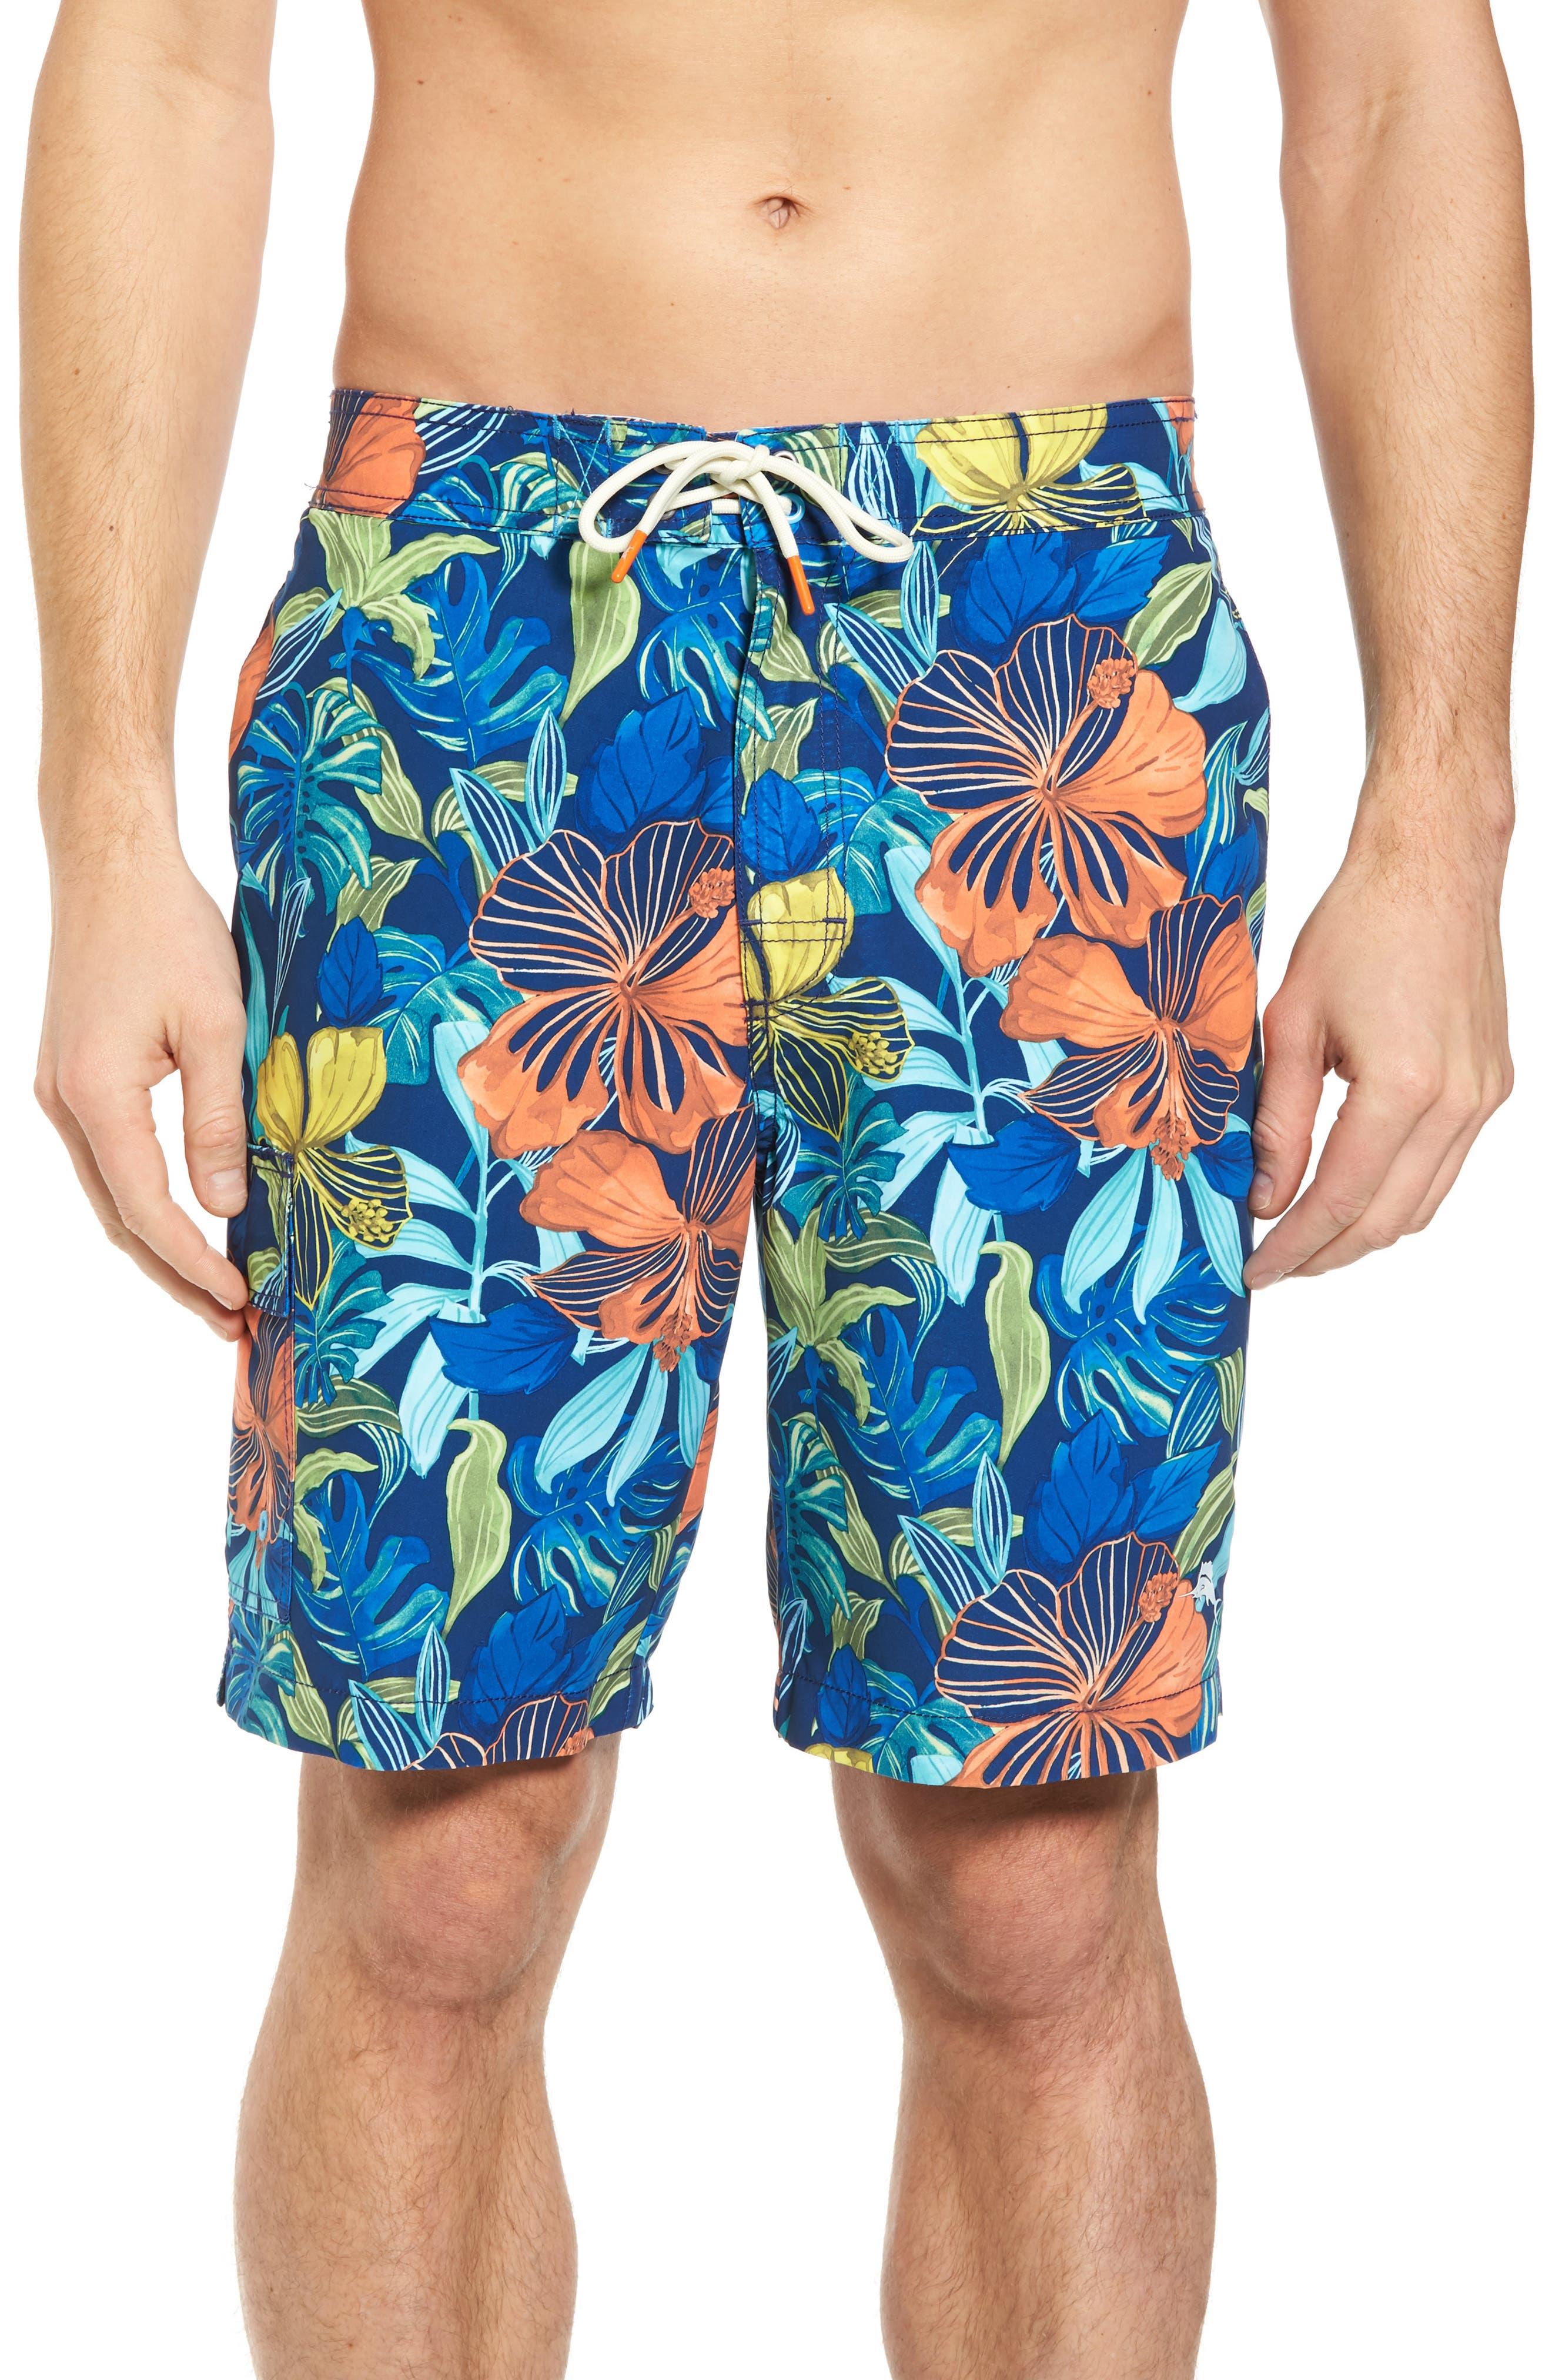 Baja Hibiscus Beach Swim Trunks,                         Main,                         color, Kingdom Blue